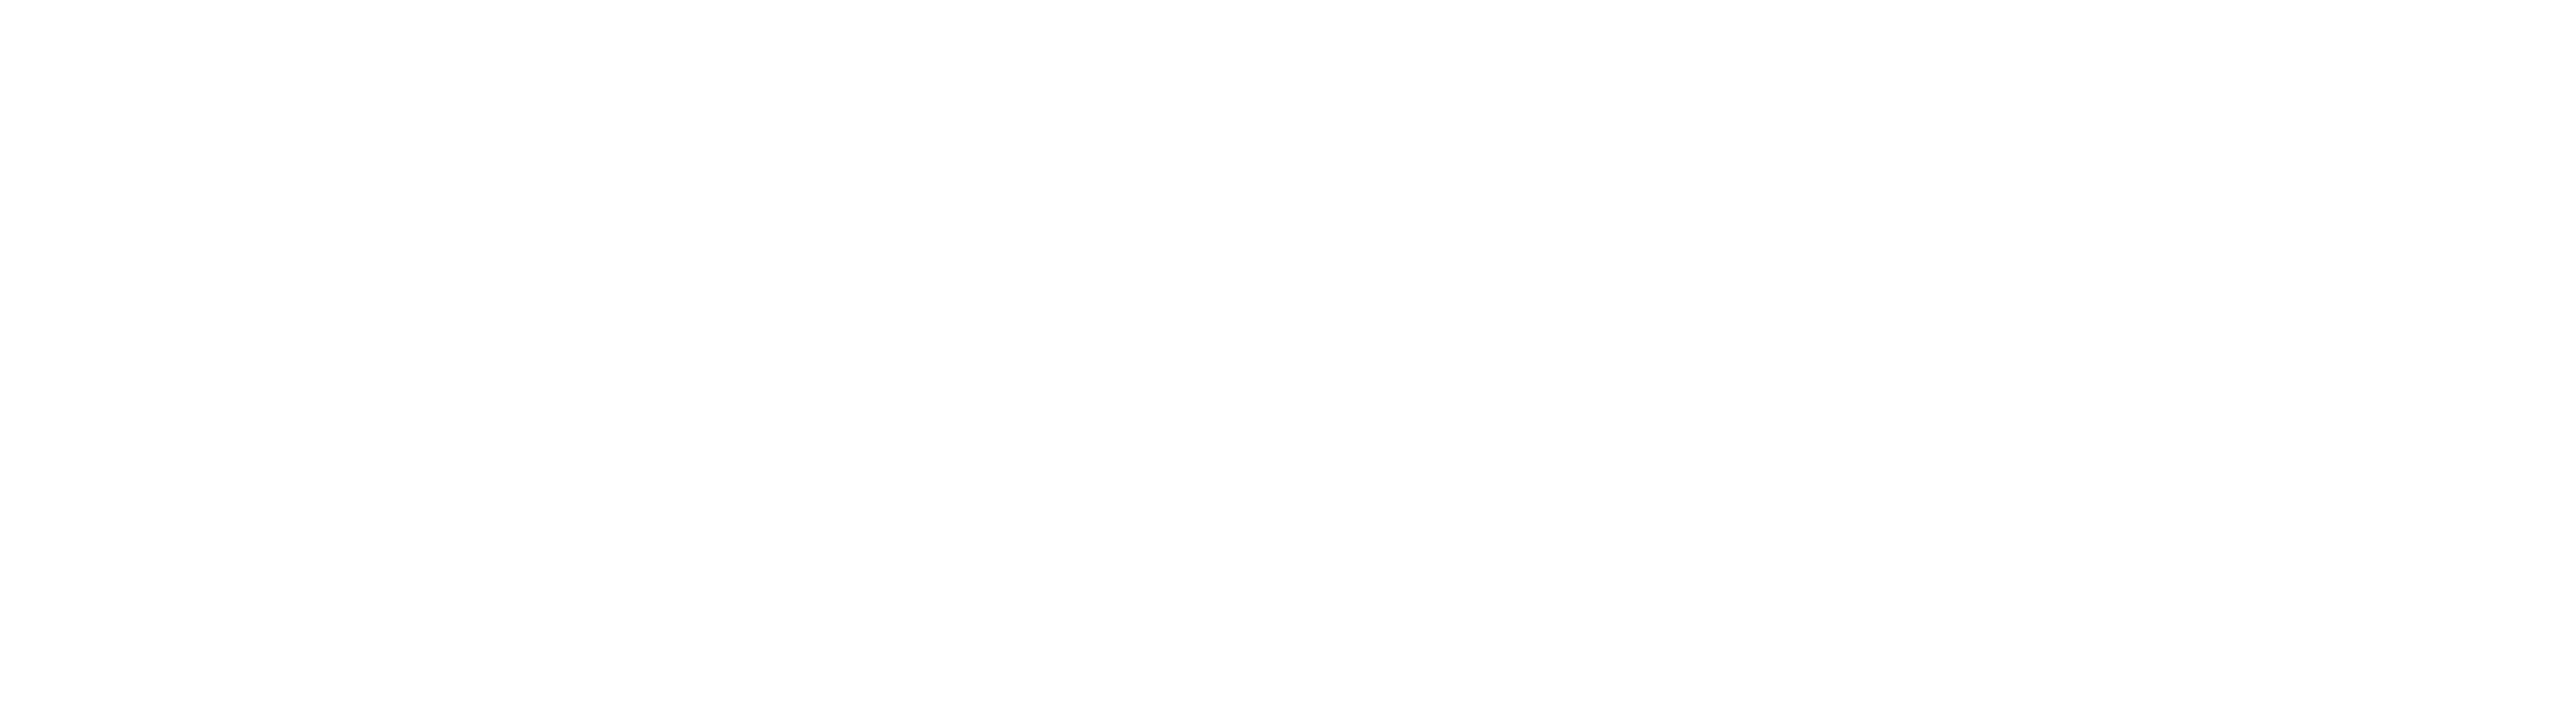 Swansea University Covid Fund